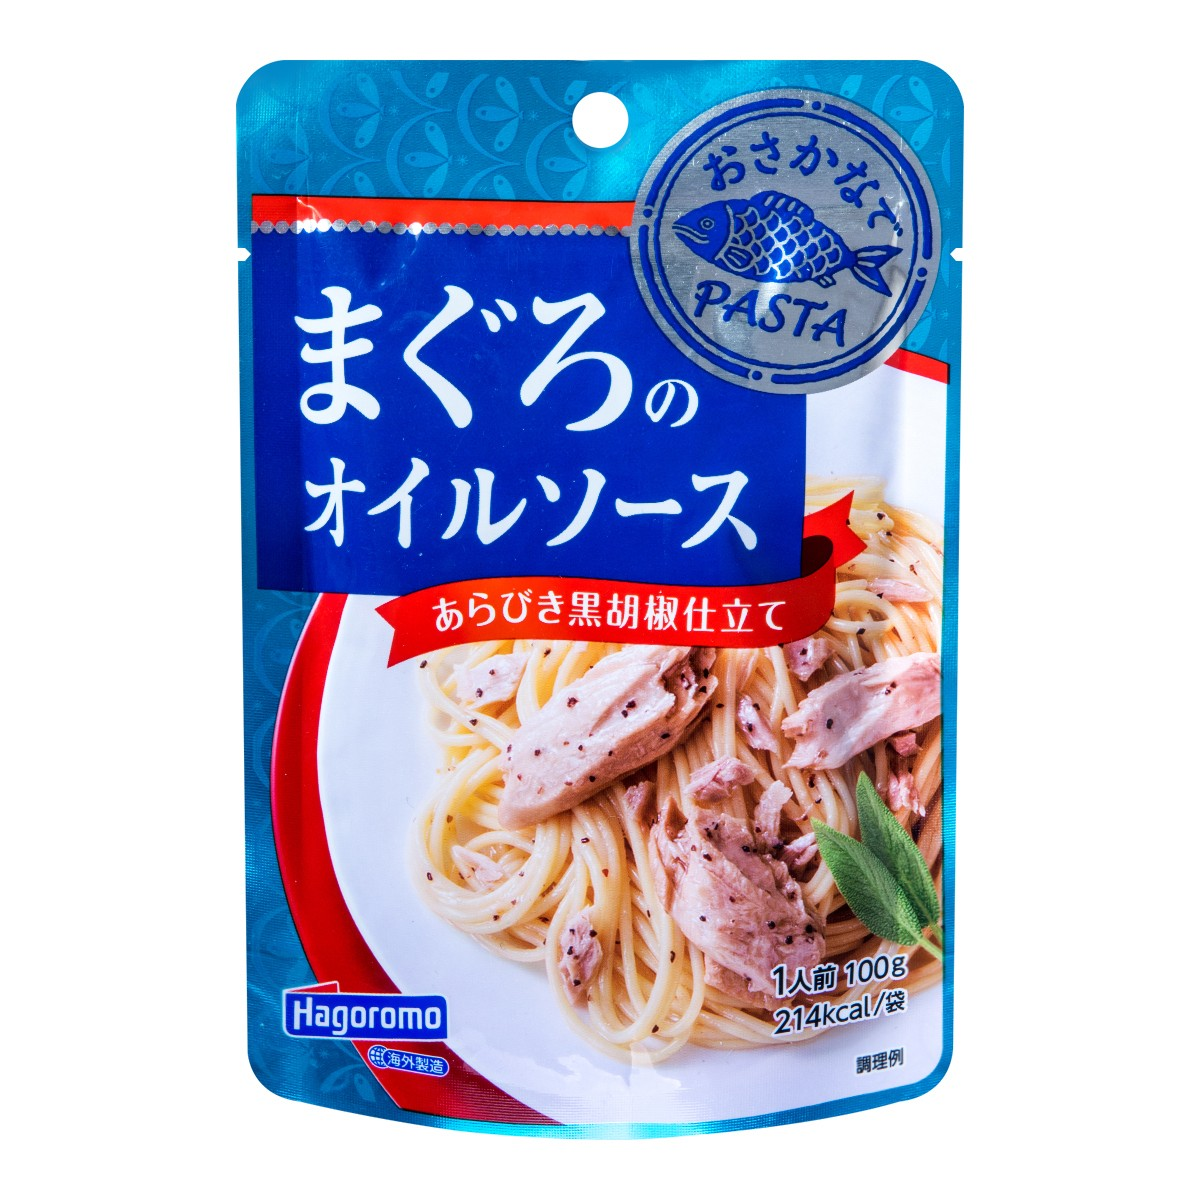 Hagoromo Tuna Soybean Oil Sauce 100g